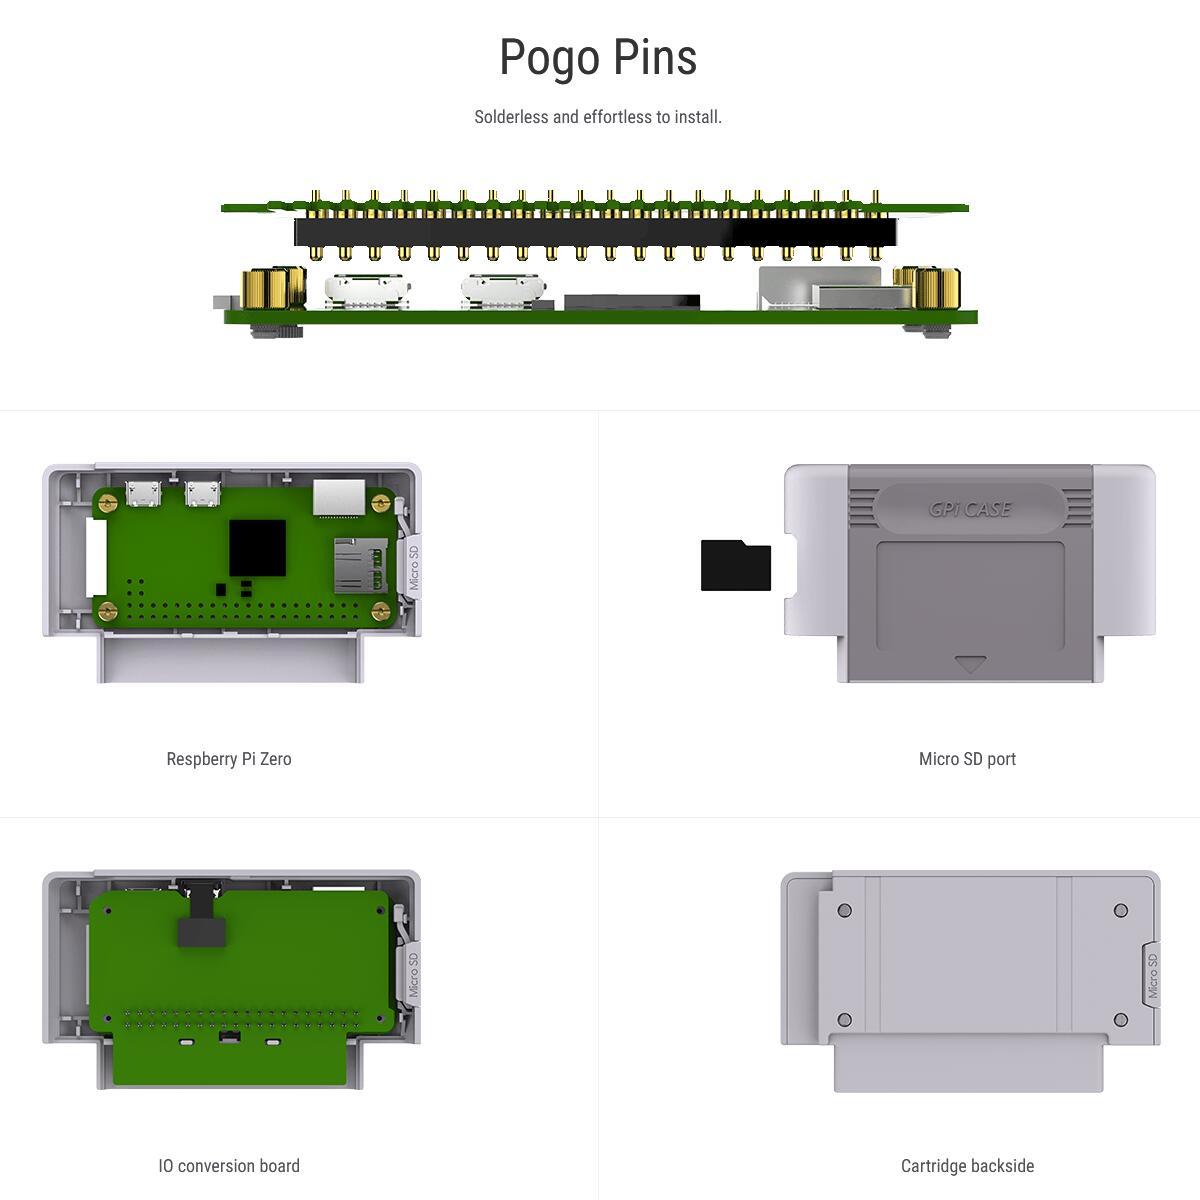 cheapest Raspberry Pi Zero Handheld Game Console GPi Case Safe Shutdown 128GB 14000  Games Customized ES Retropie Emulation Game Station